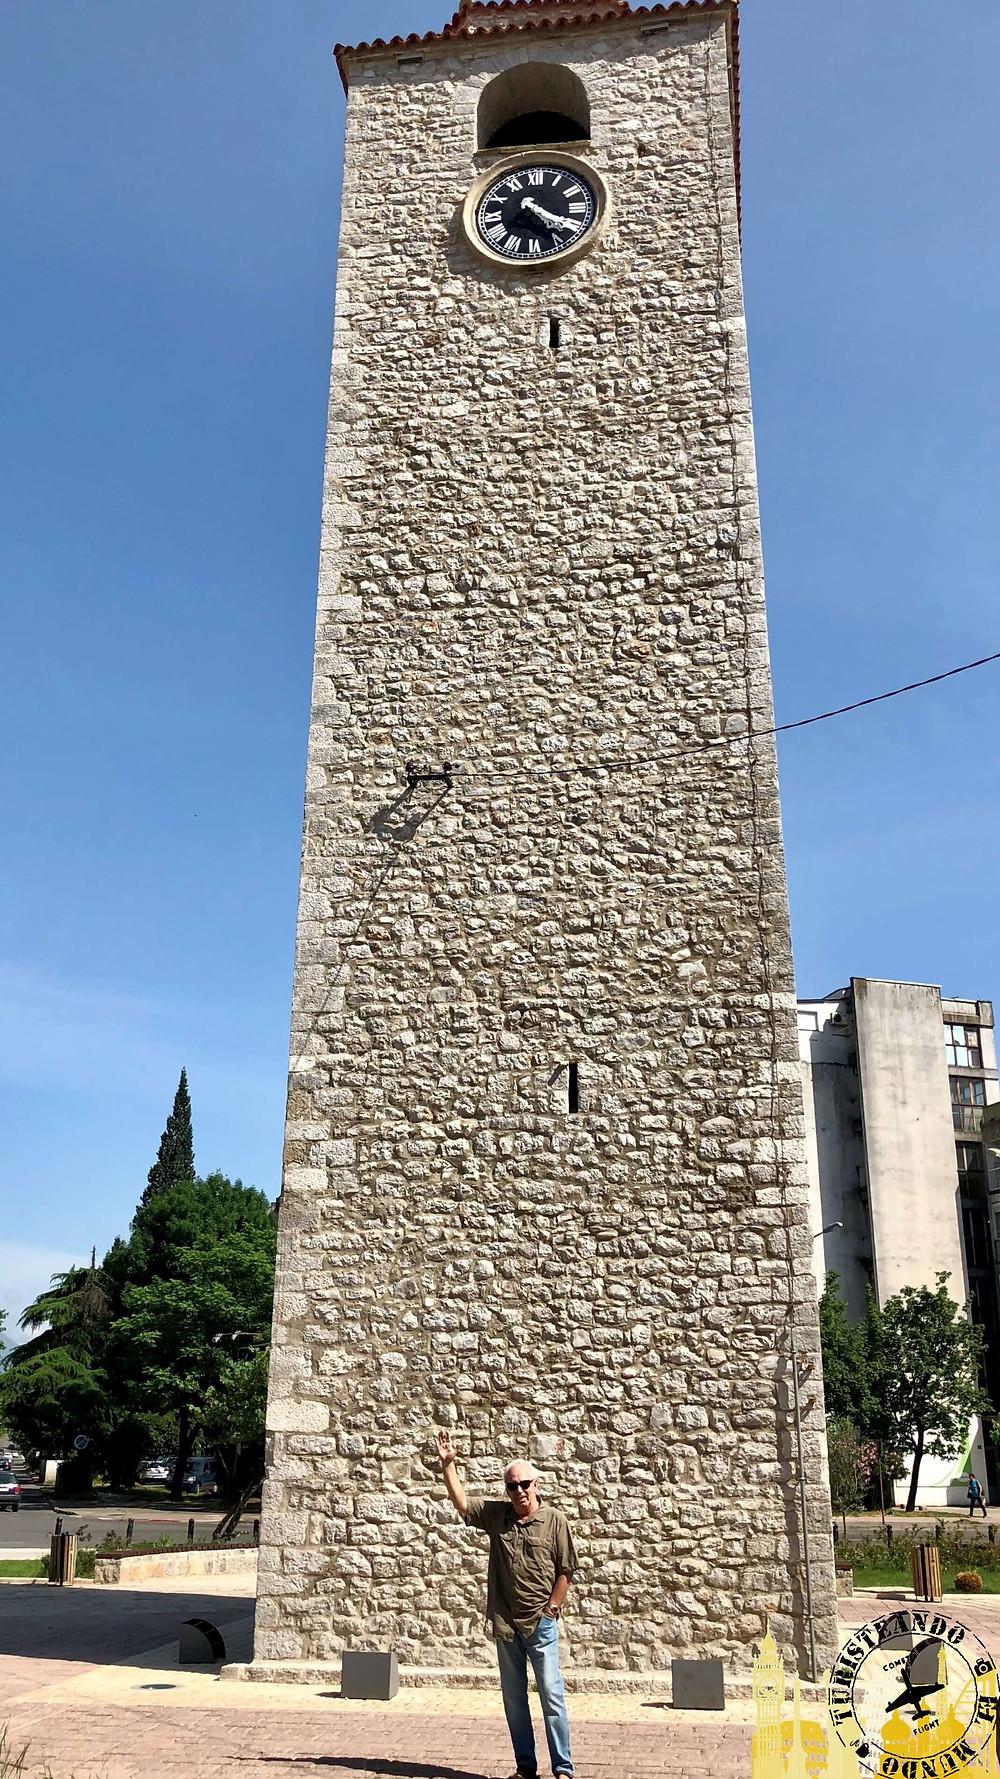 Barrio otomano Stara Varoš. Torre del reloj (Podgorica)